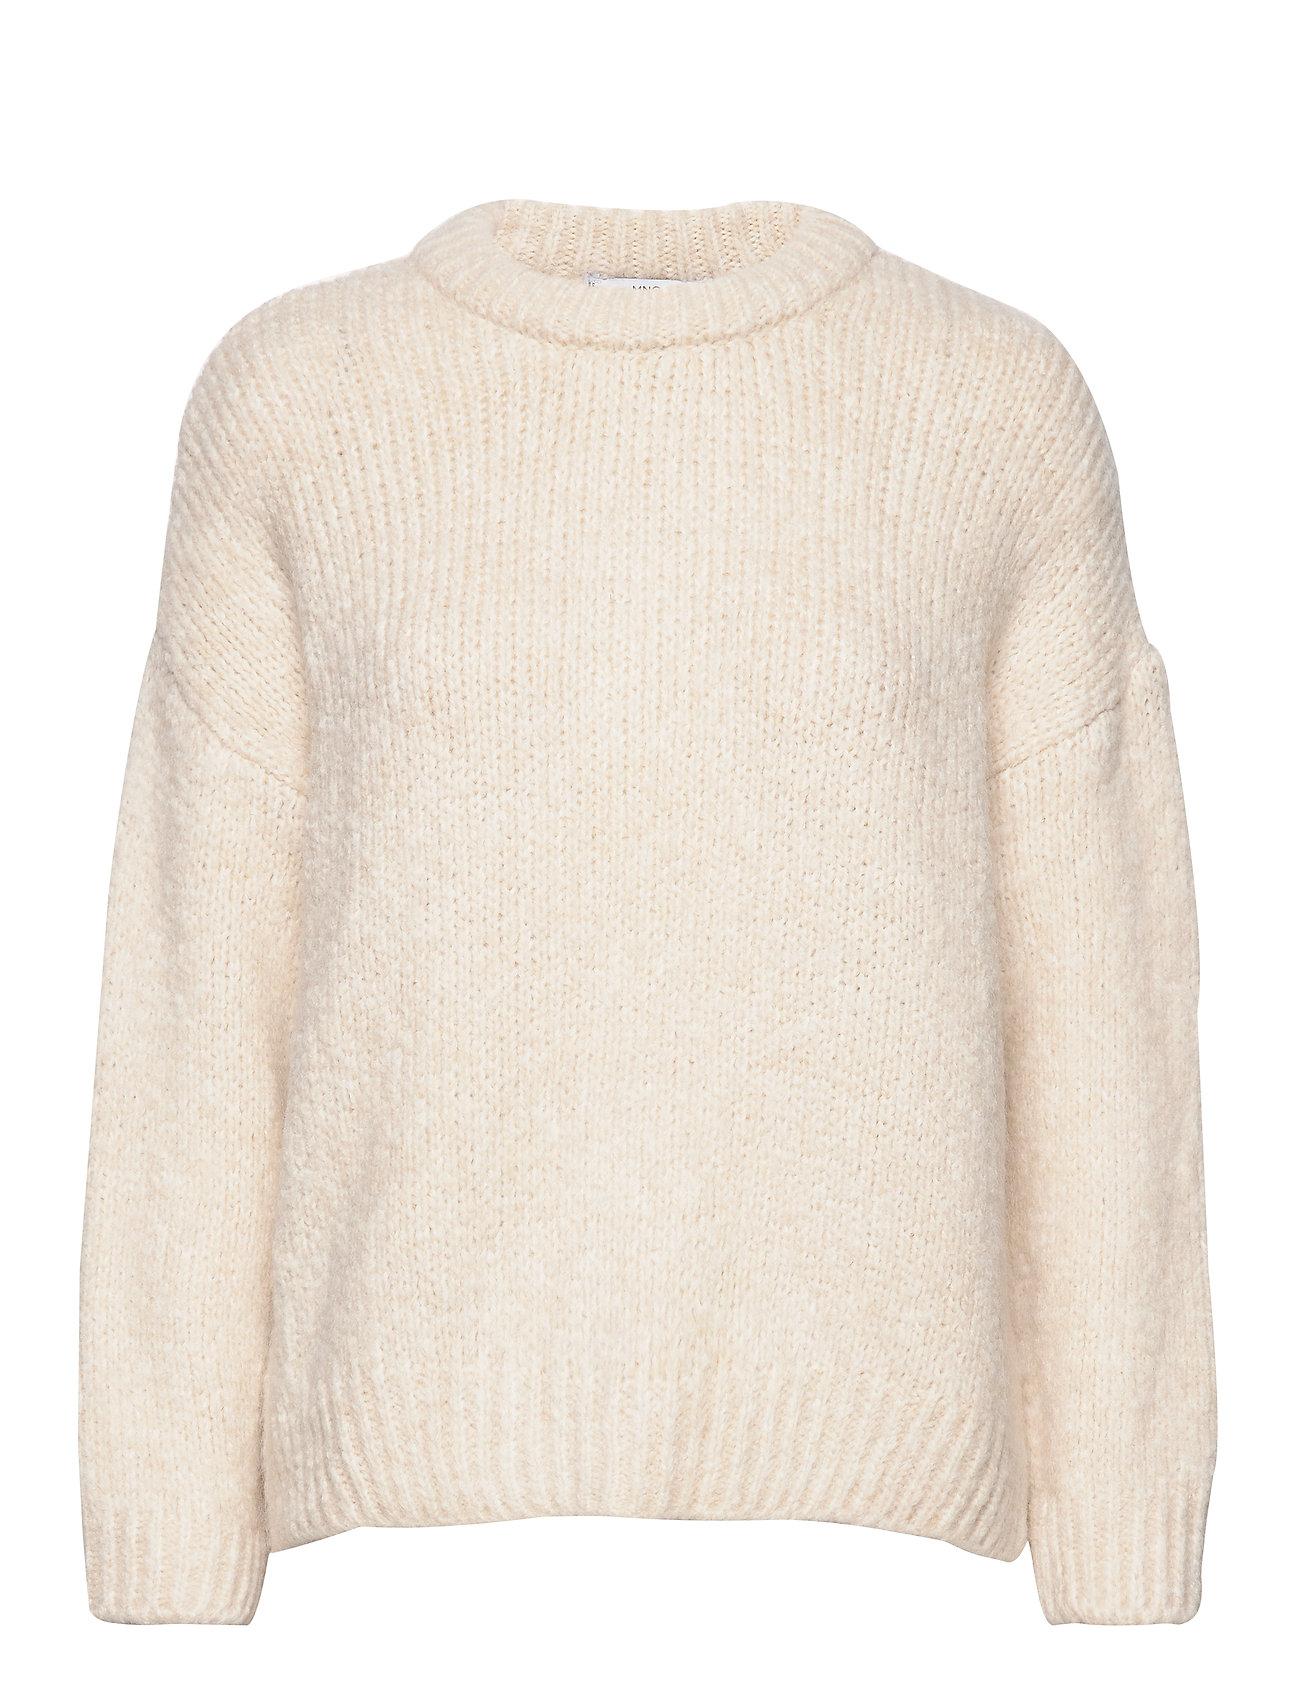 Mango Chunky-knit sweater - LIGHT BEIGE